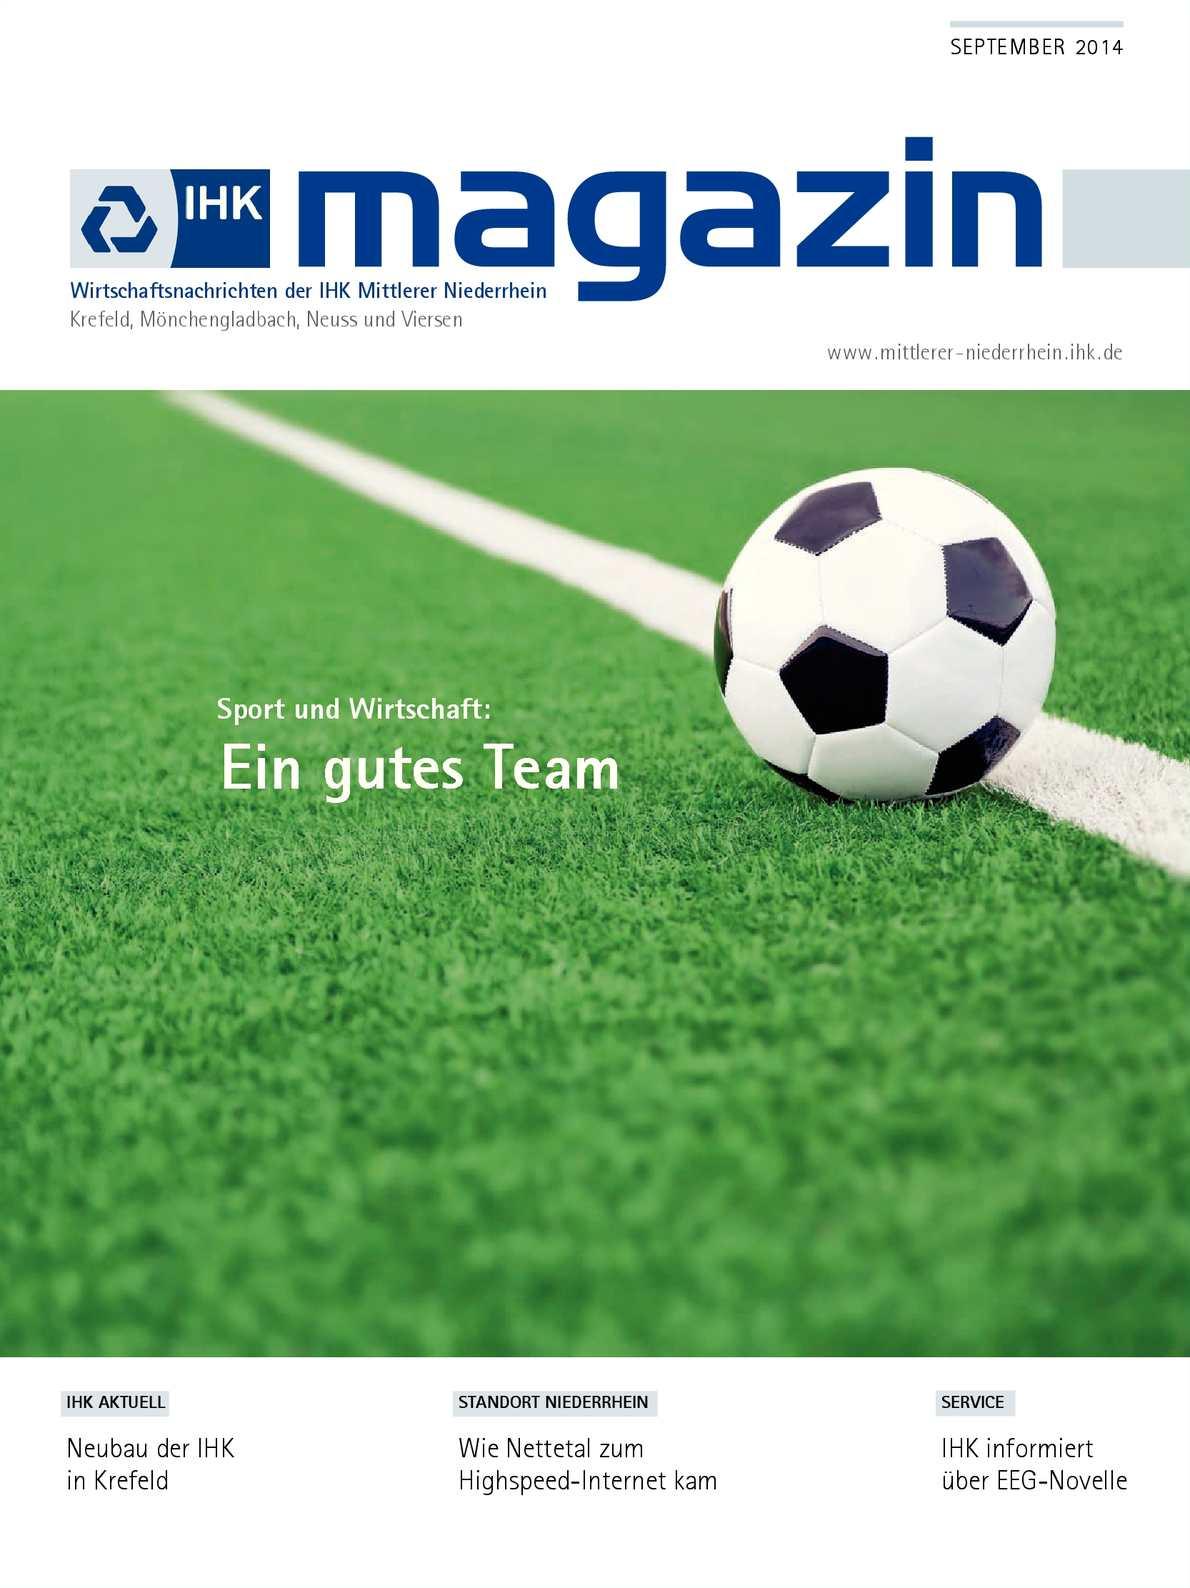 Calaméo - IHK Magazin September 2014